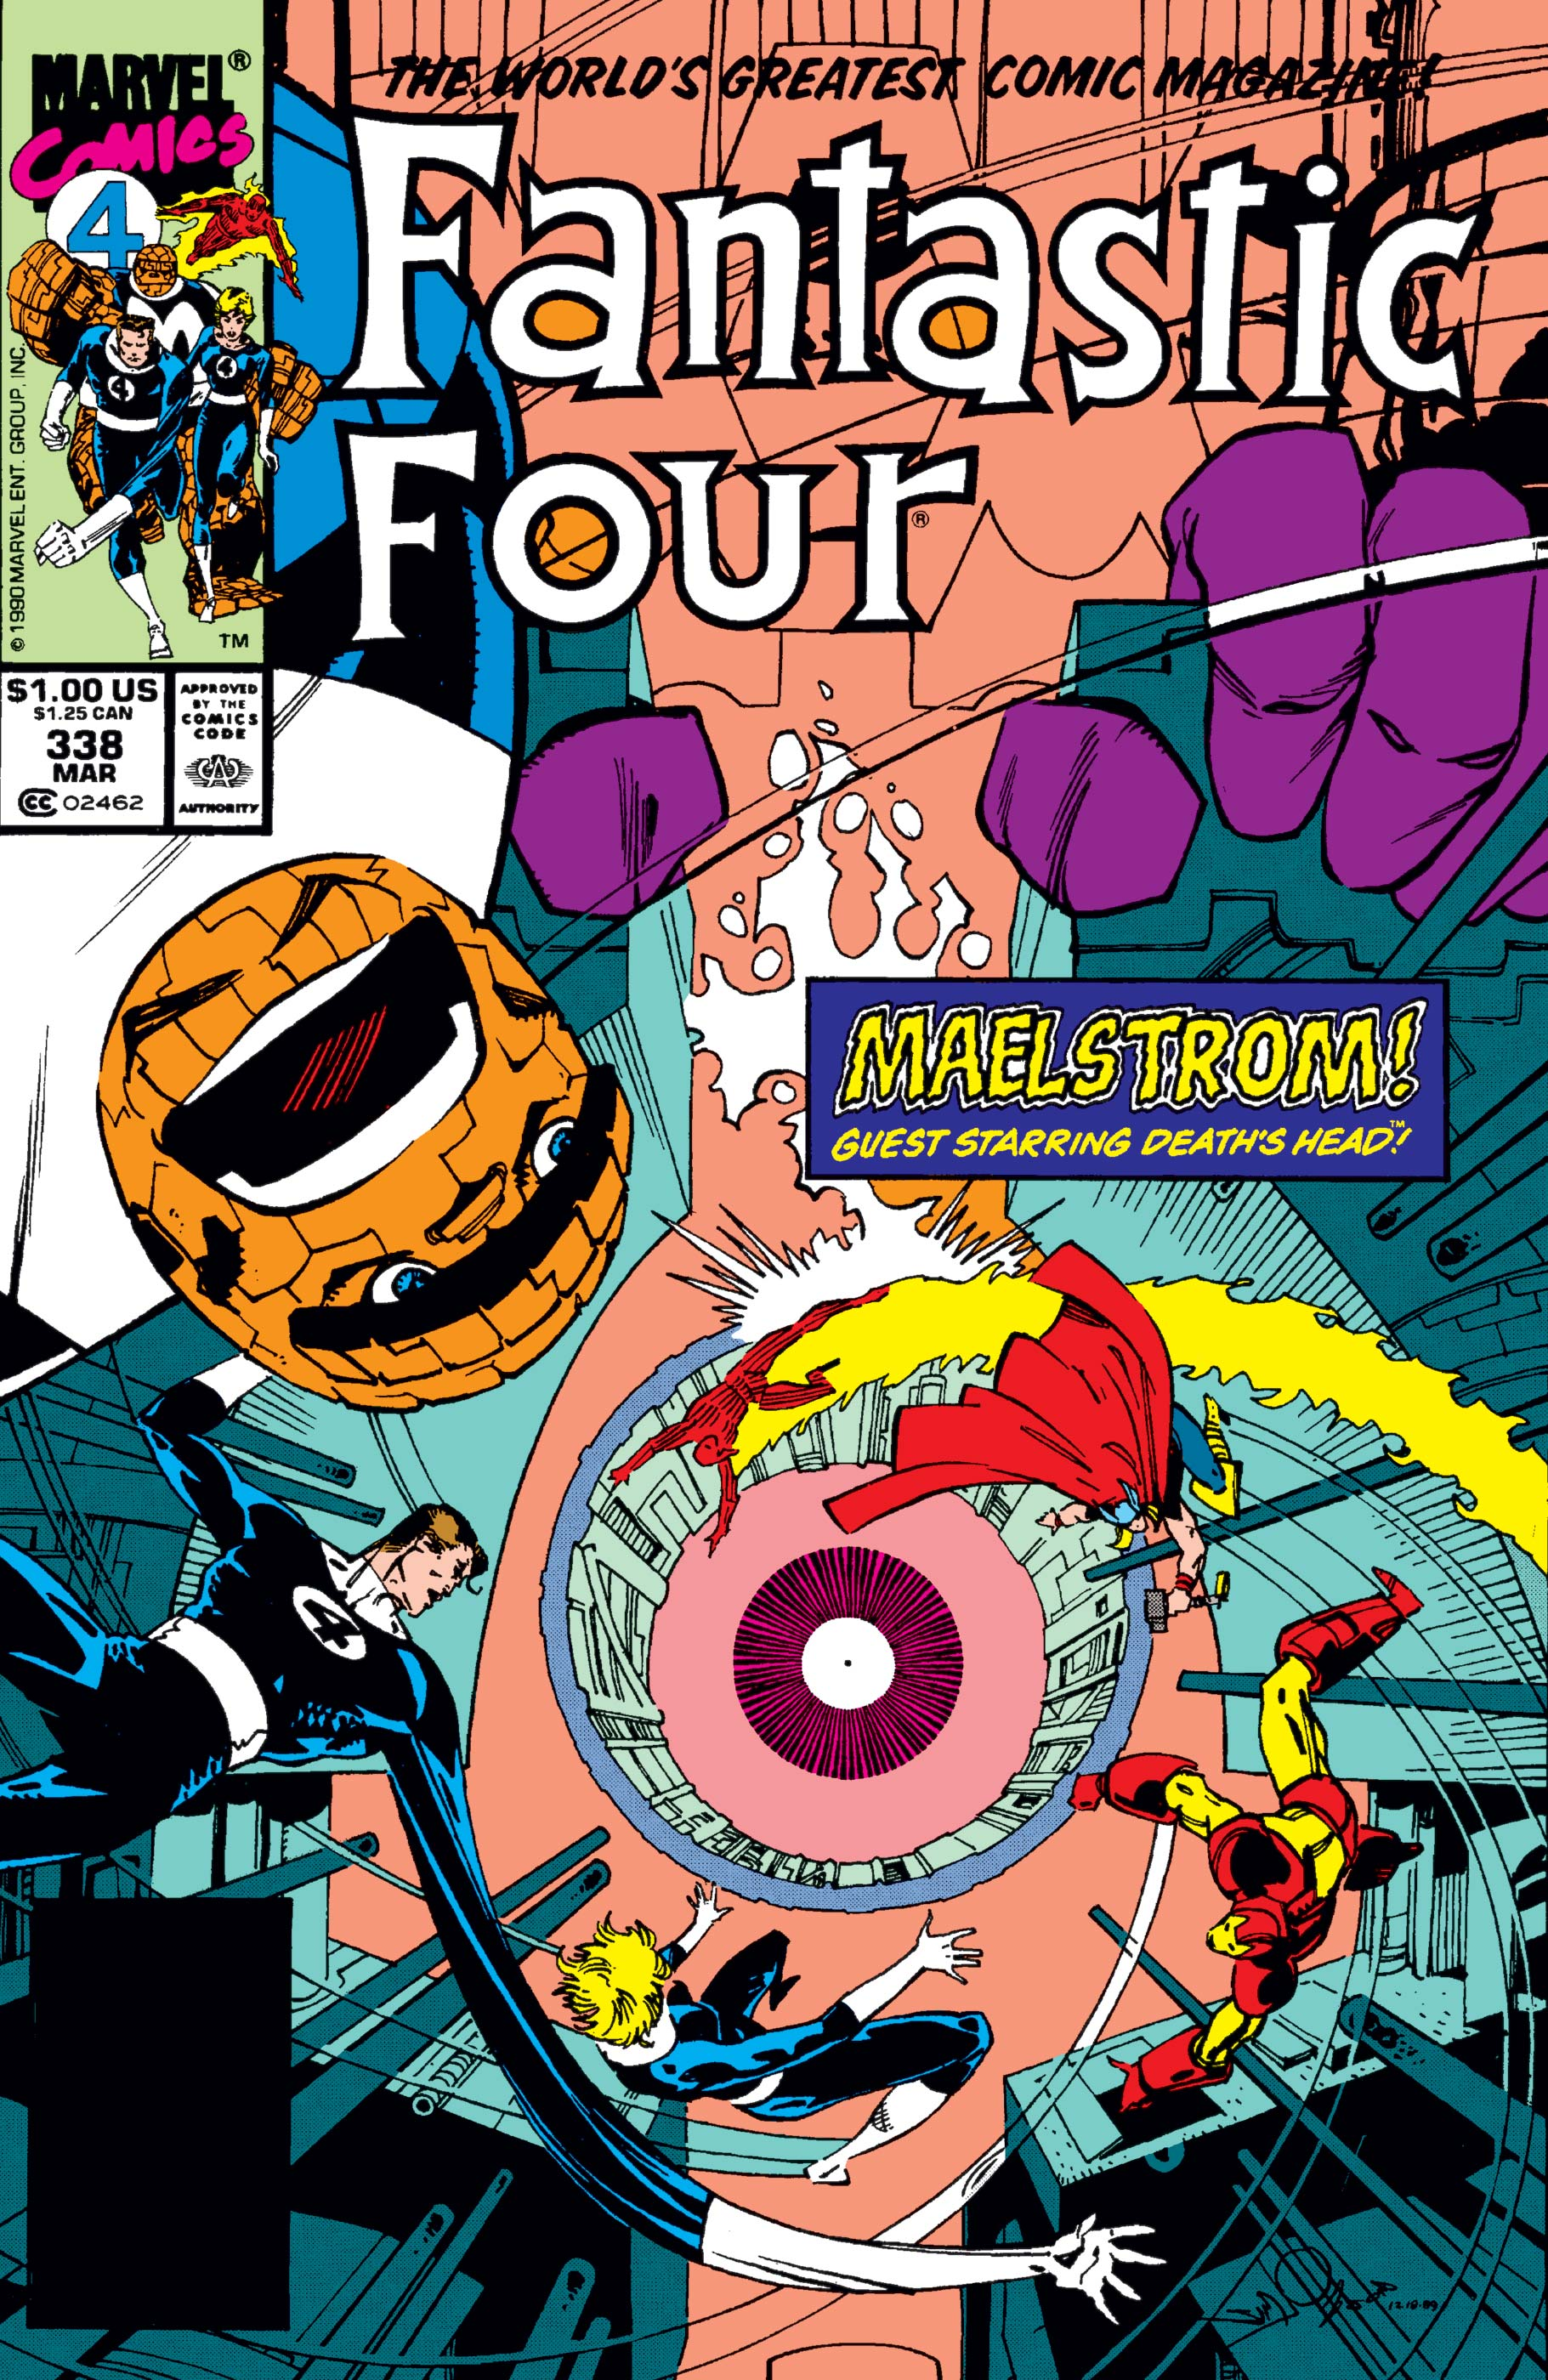 Fantastic Four (1961) #338